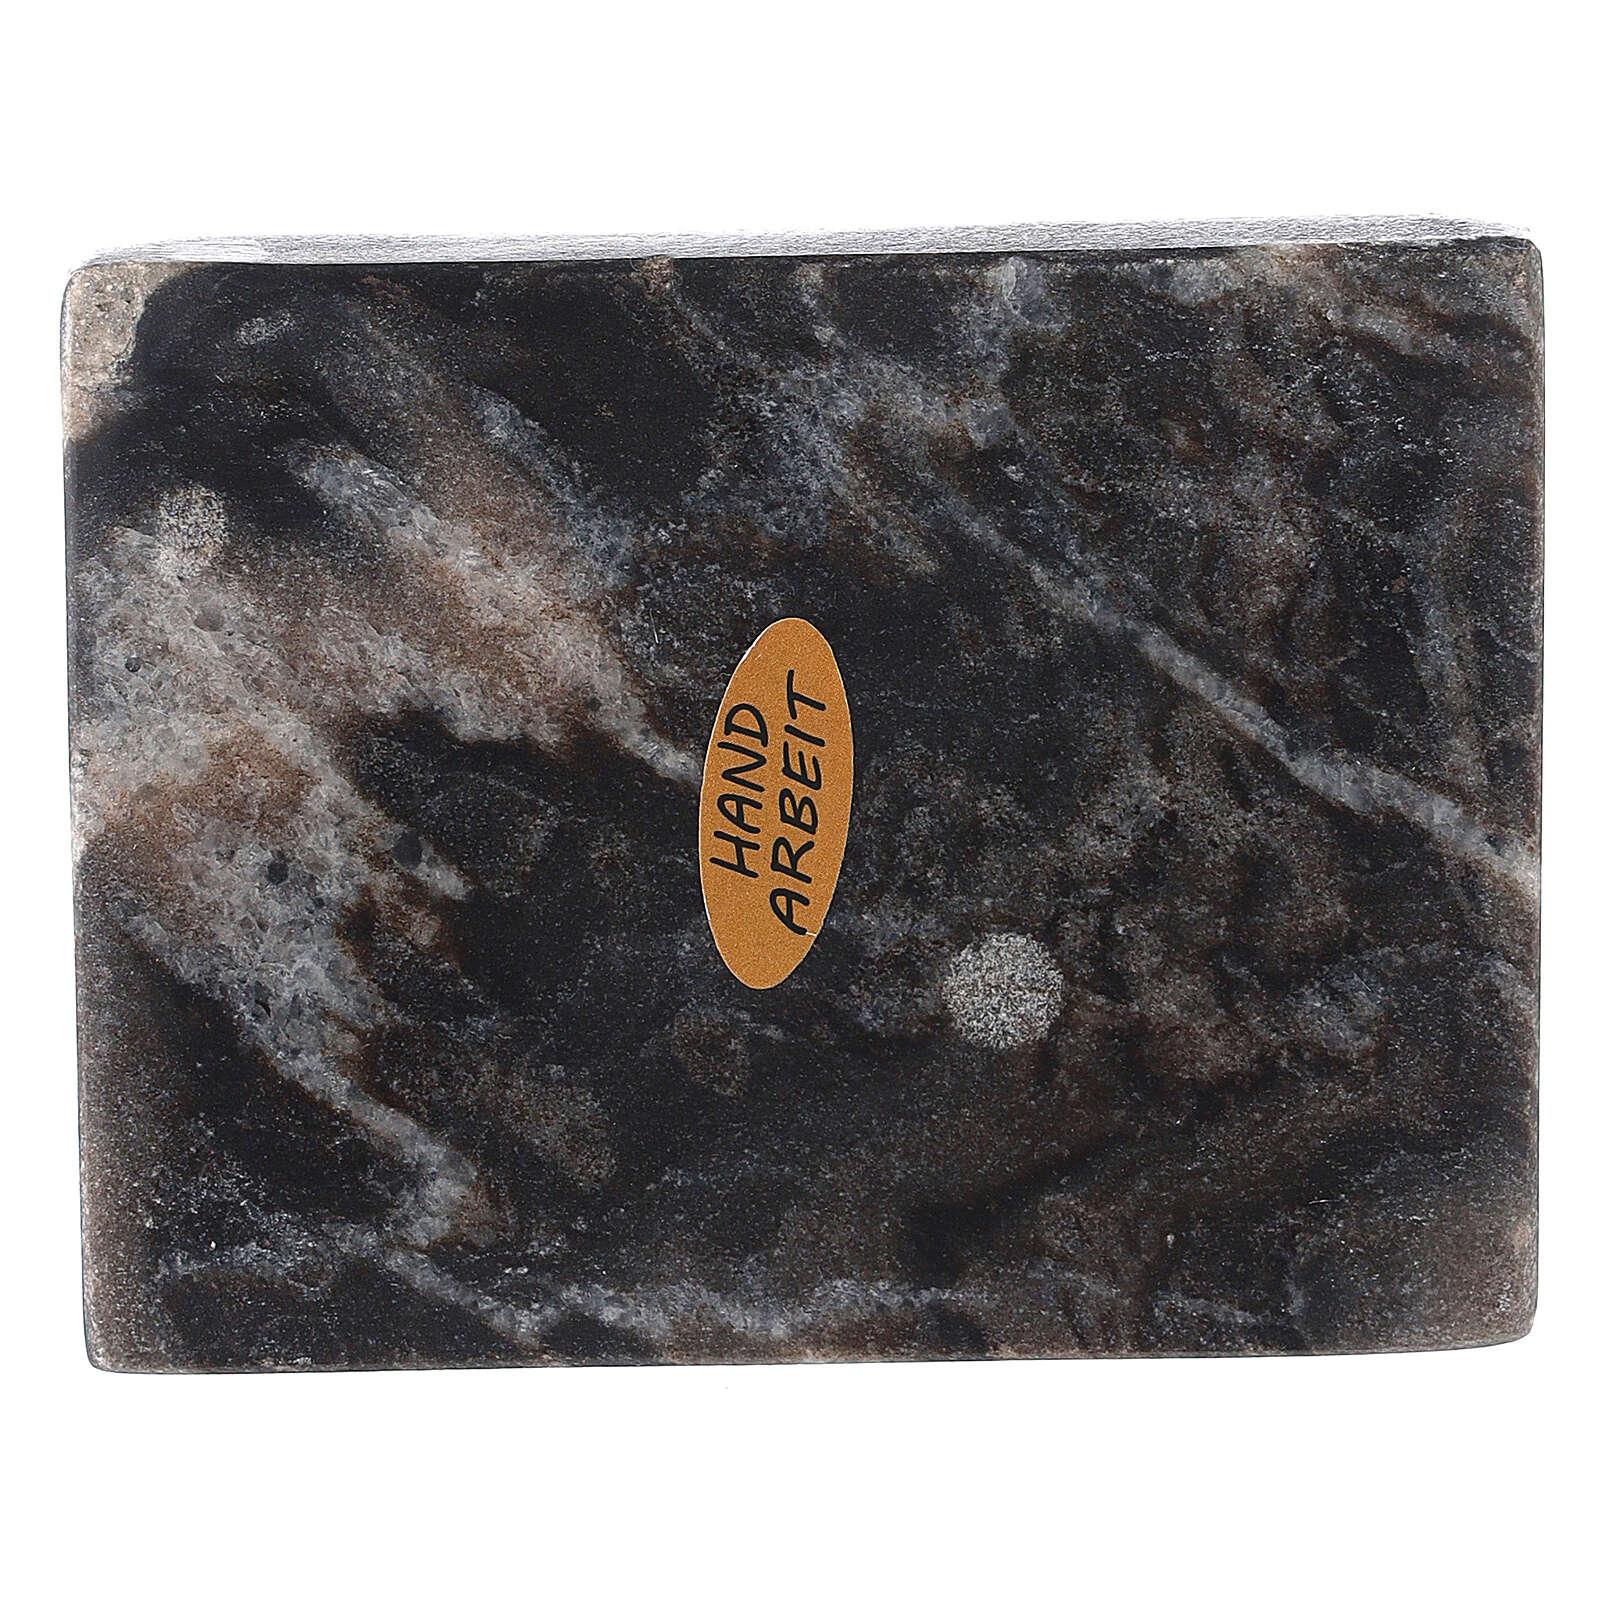 Plato portavela rectangular piedra natural 10x8 cm 3